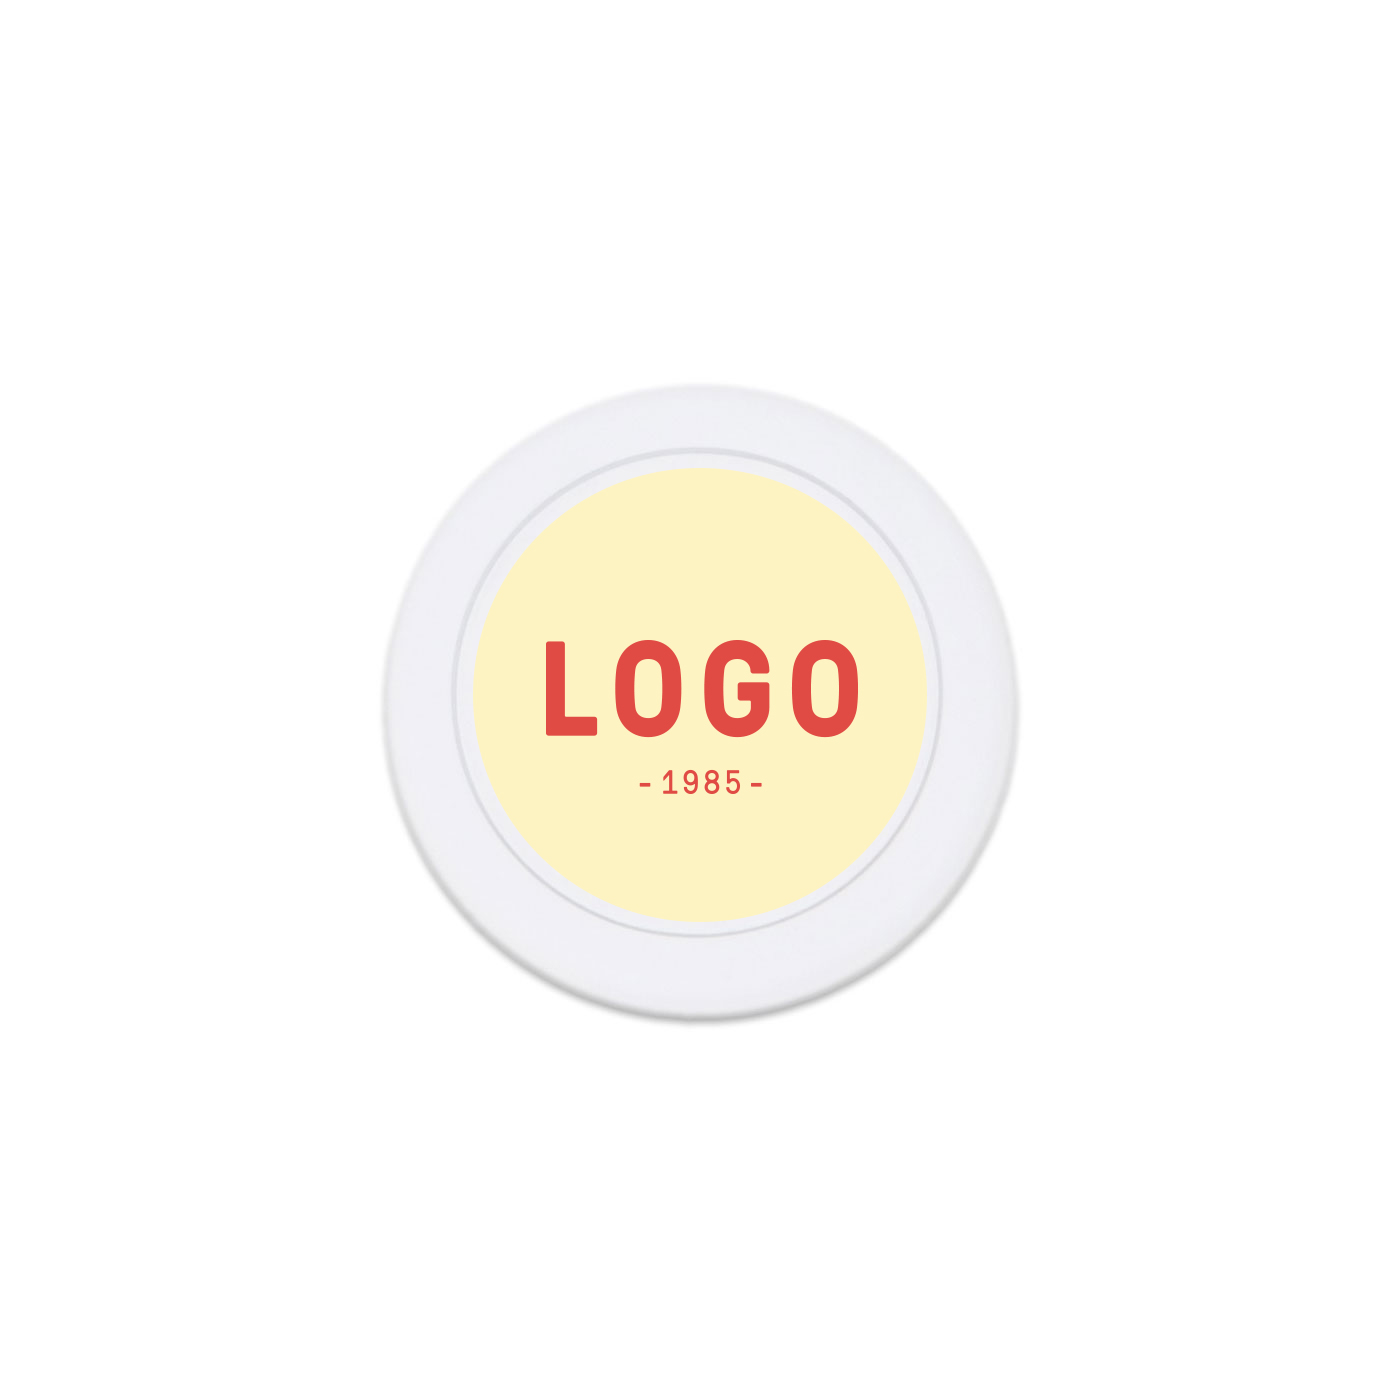 130220 smart button full color imprint